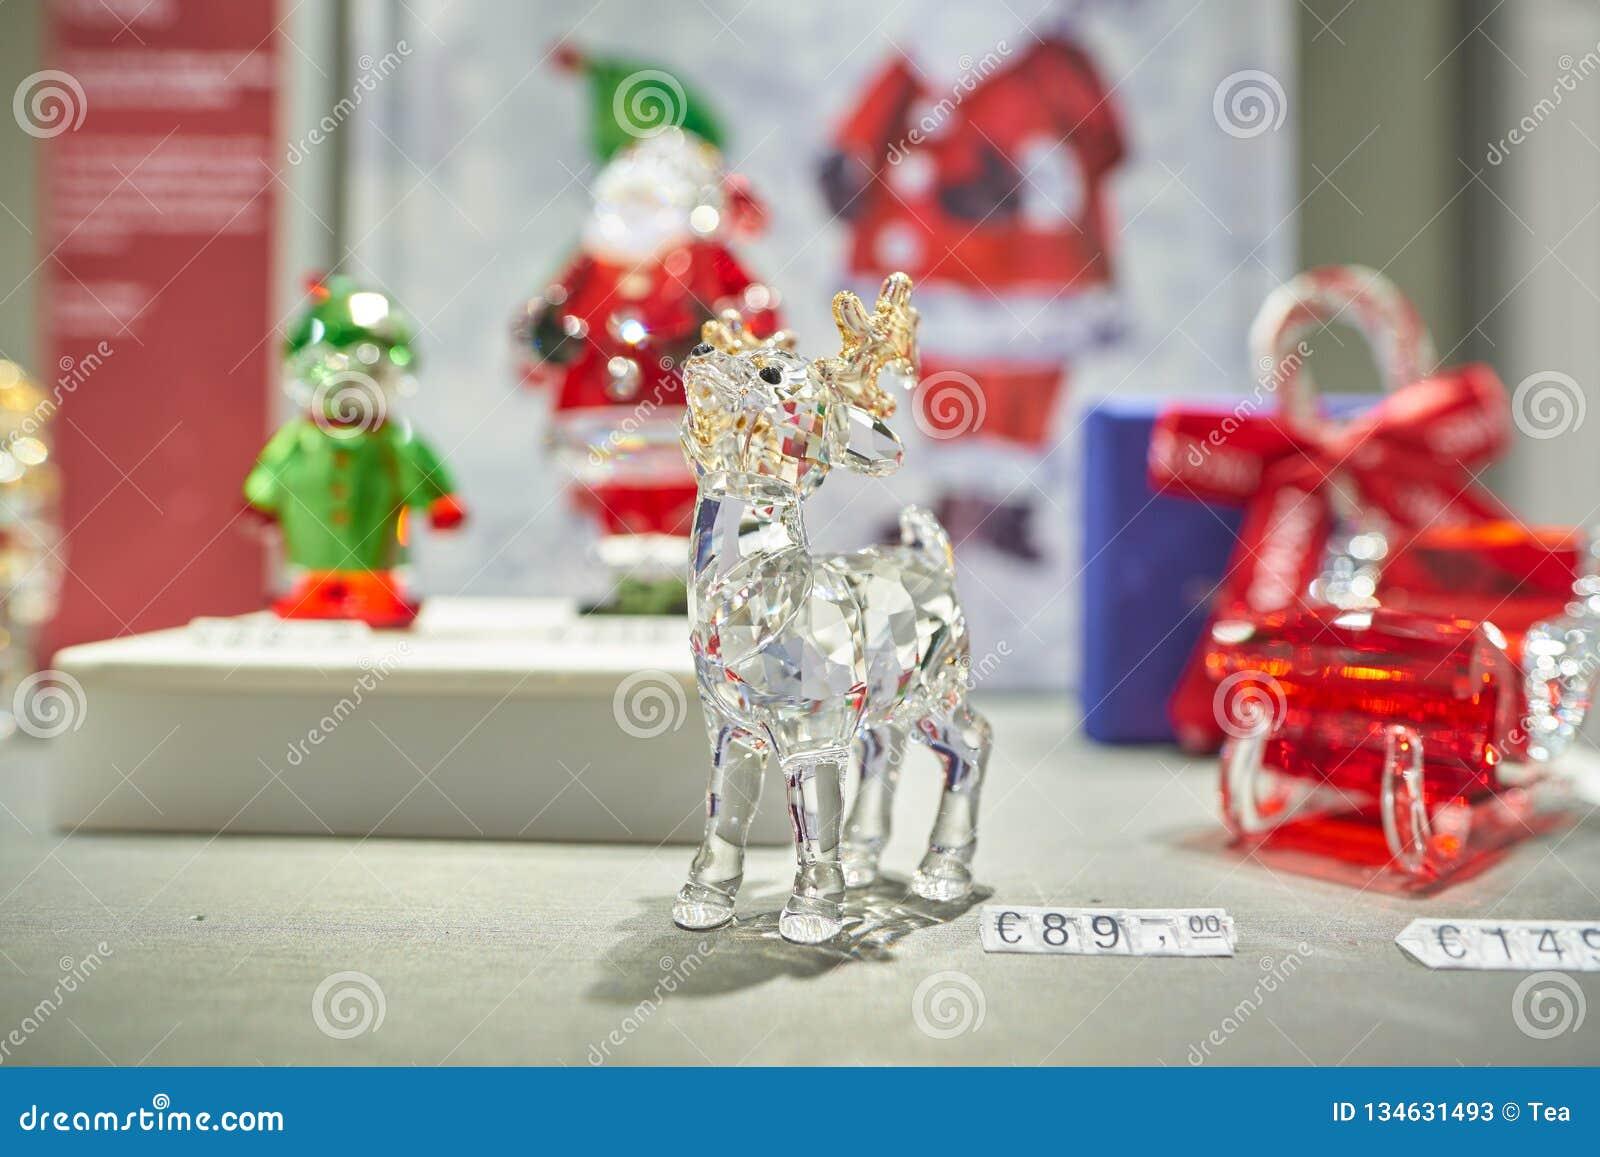 930b19e77fc5 Swarovski editorial stock photo. Image of decorations - 134631493